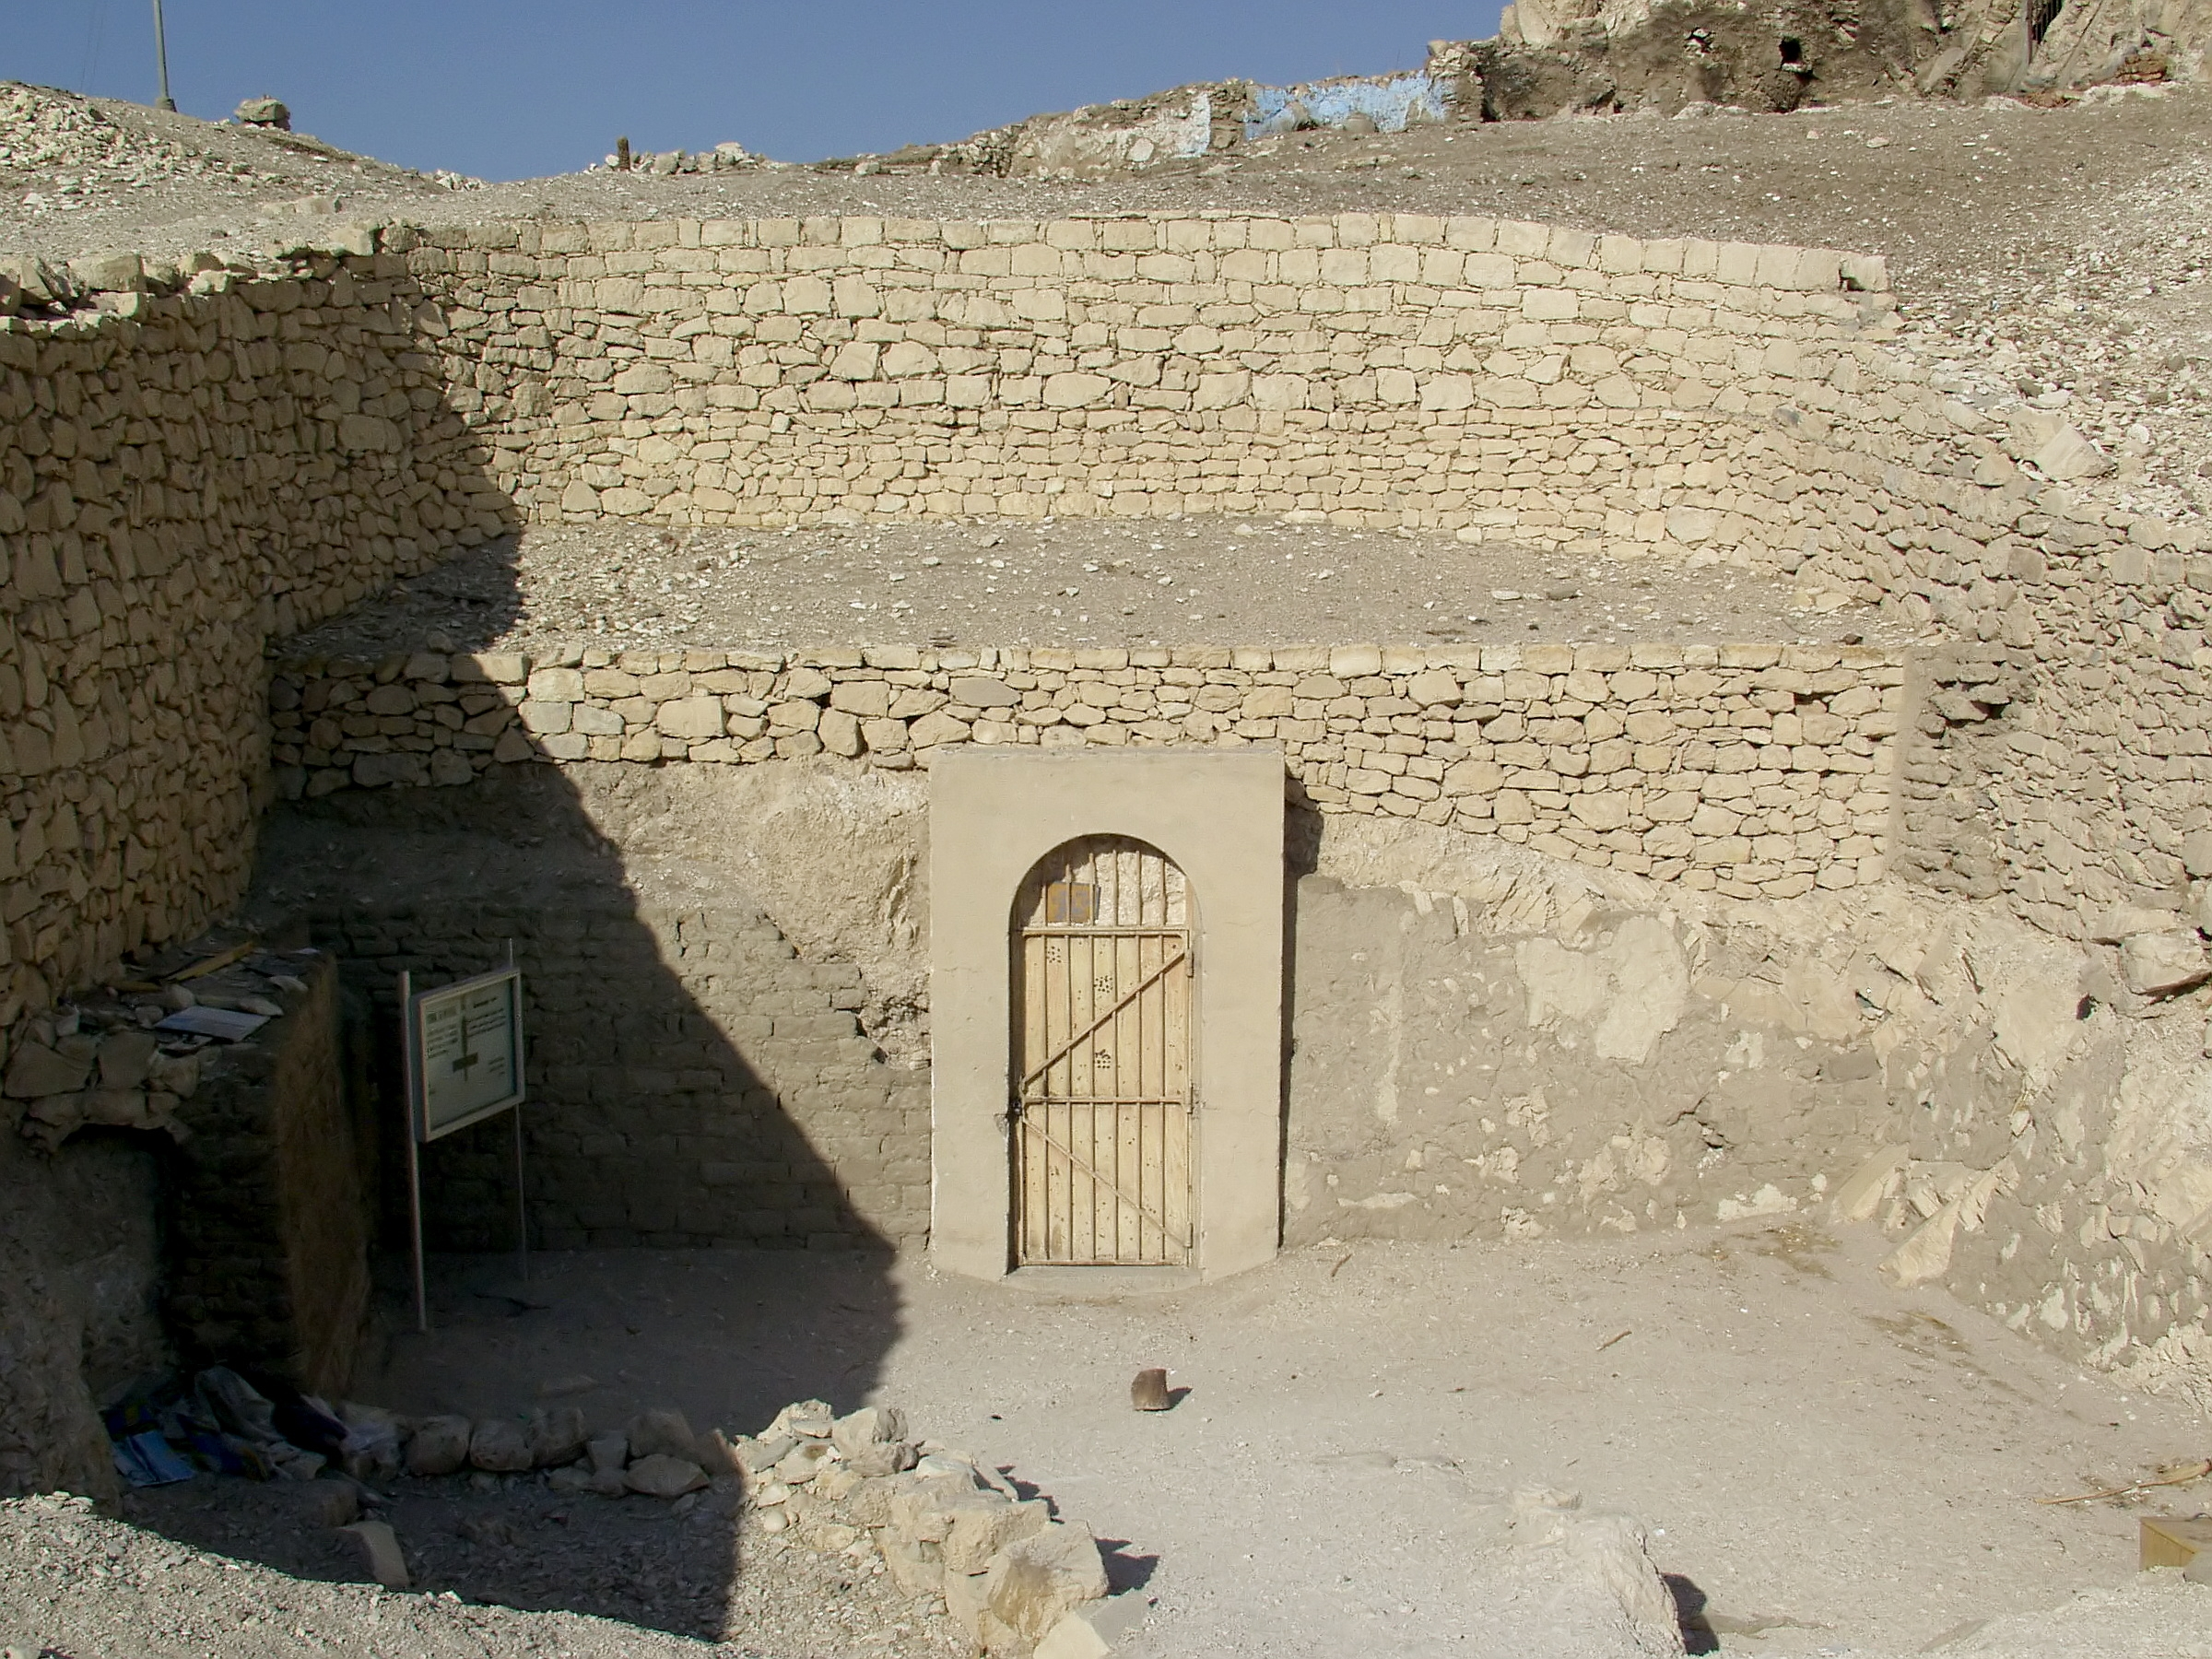 Archivo:Tomb of Menna (TT69) - Entrance.jpg - Wikipedia, la ...